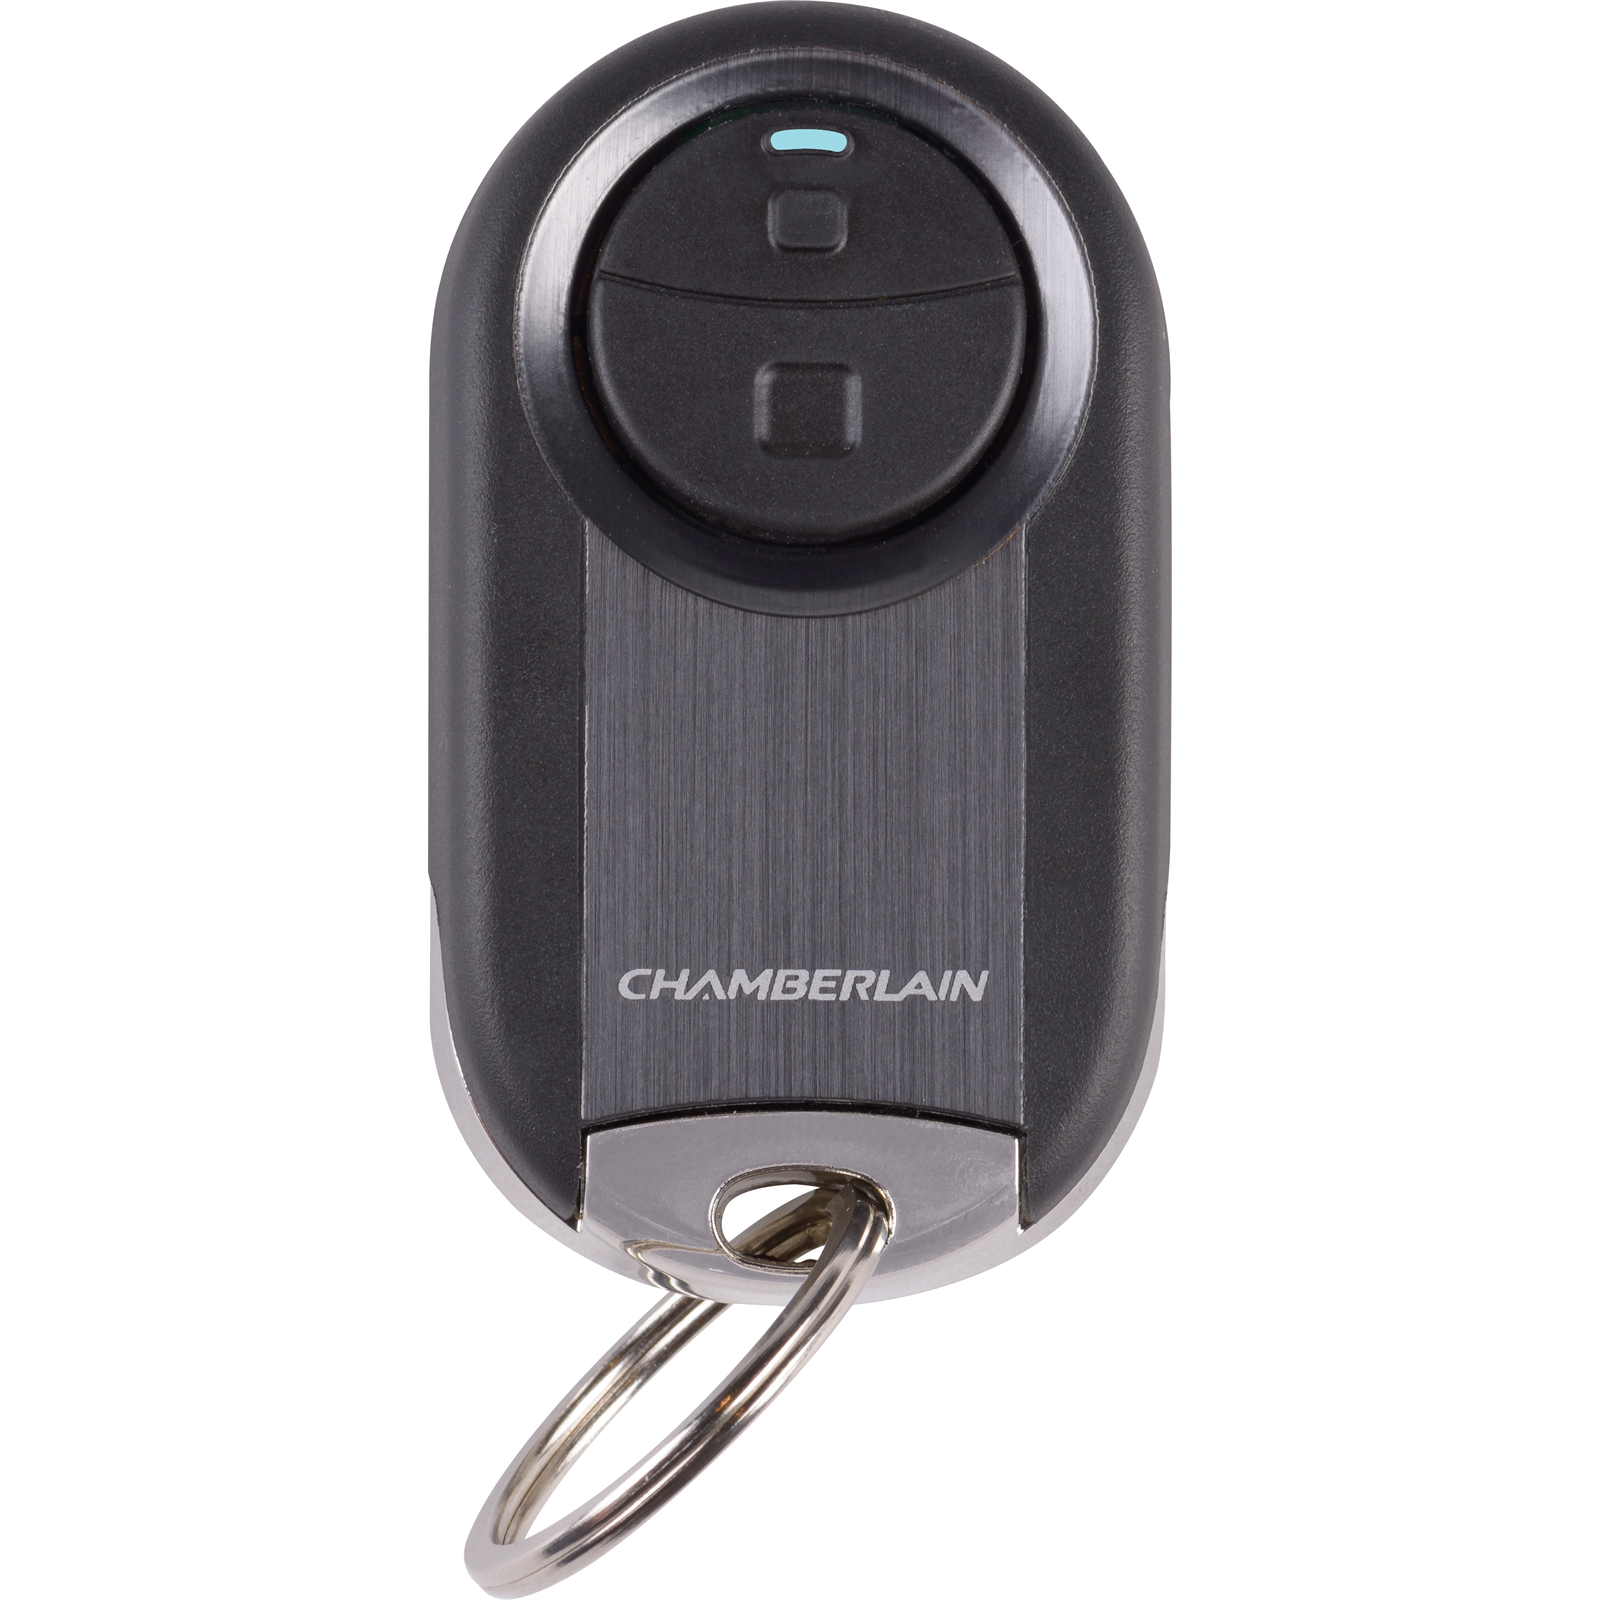 Chamberlain MC100AML Universal Remote Control Garage Door Opener